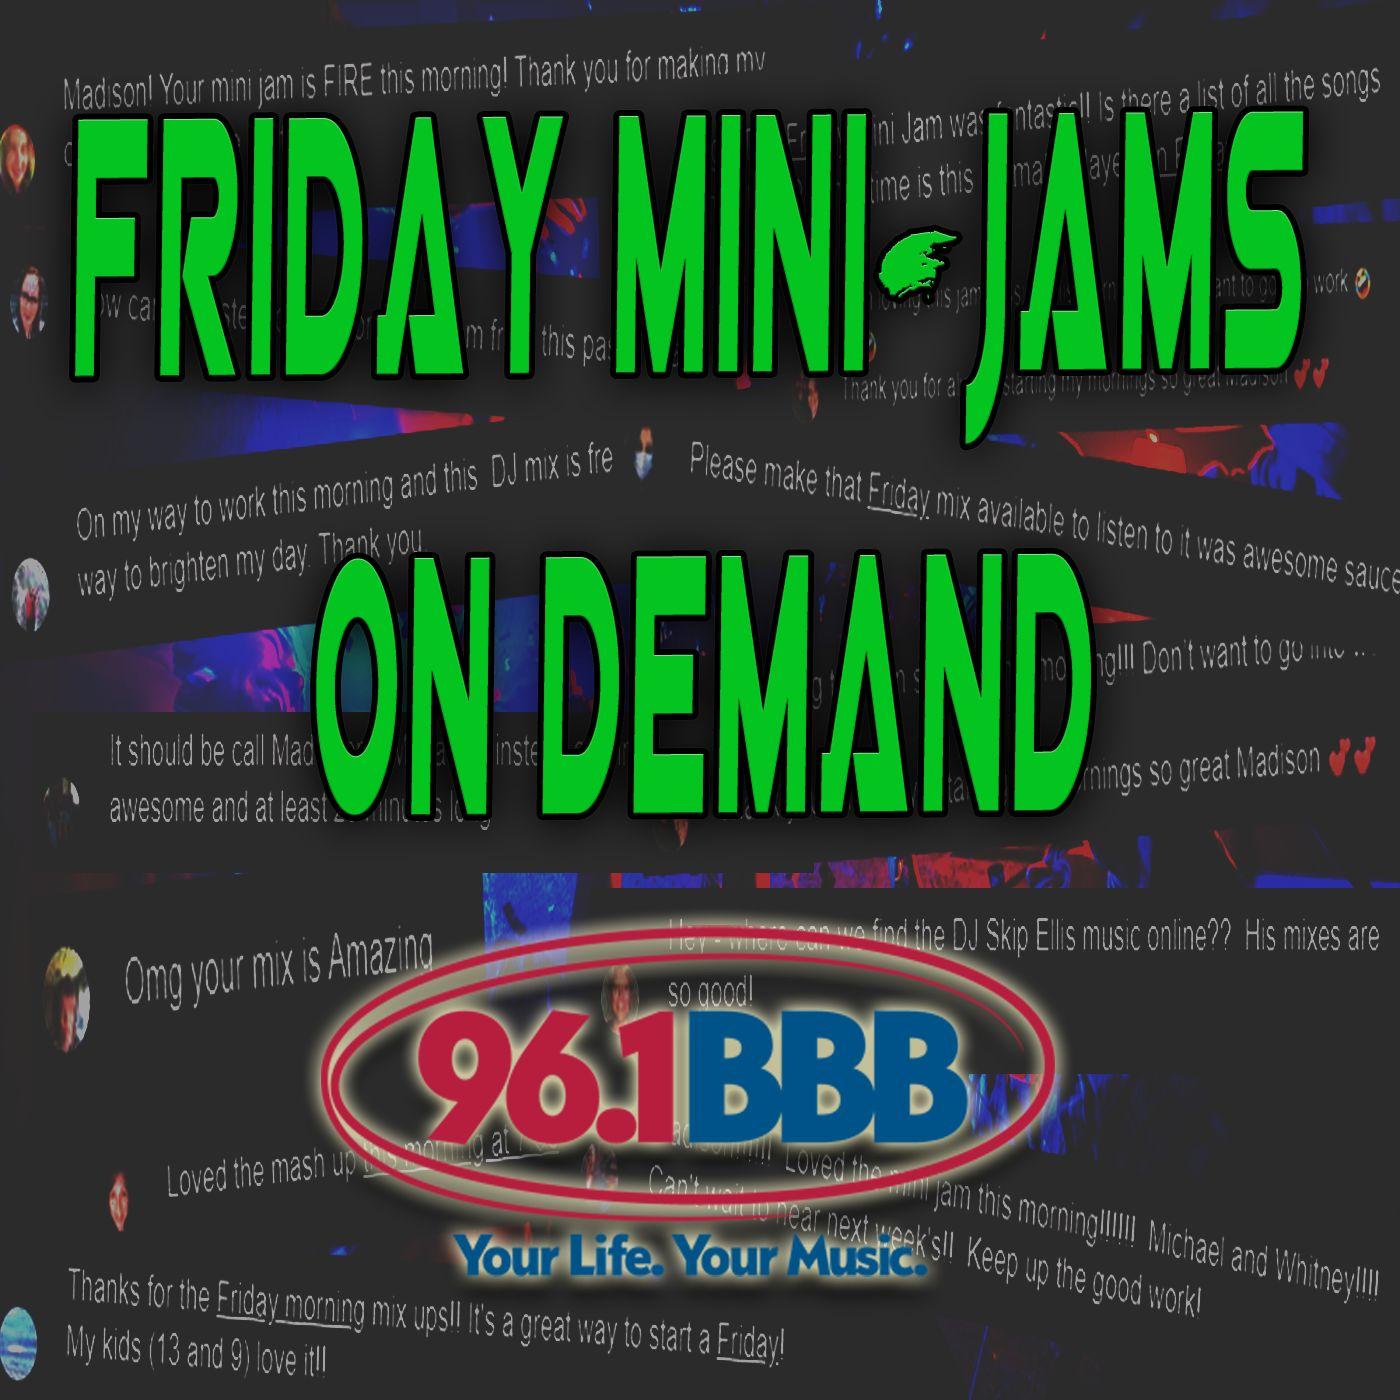 96.1 BBB Friday Mini-Jams on Demand